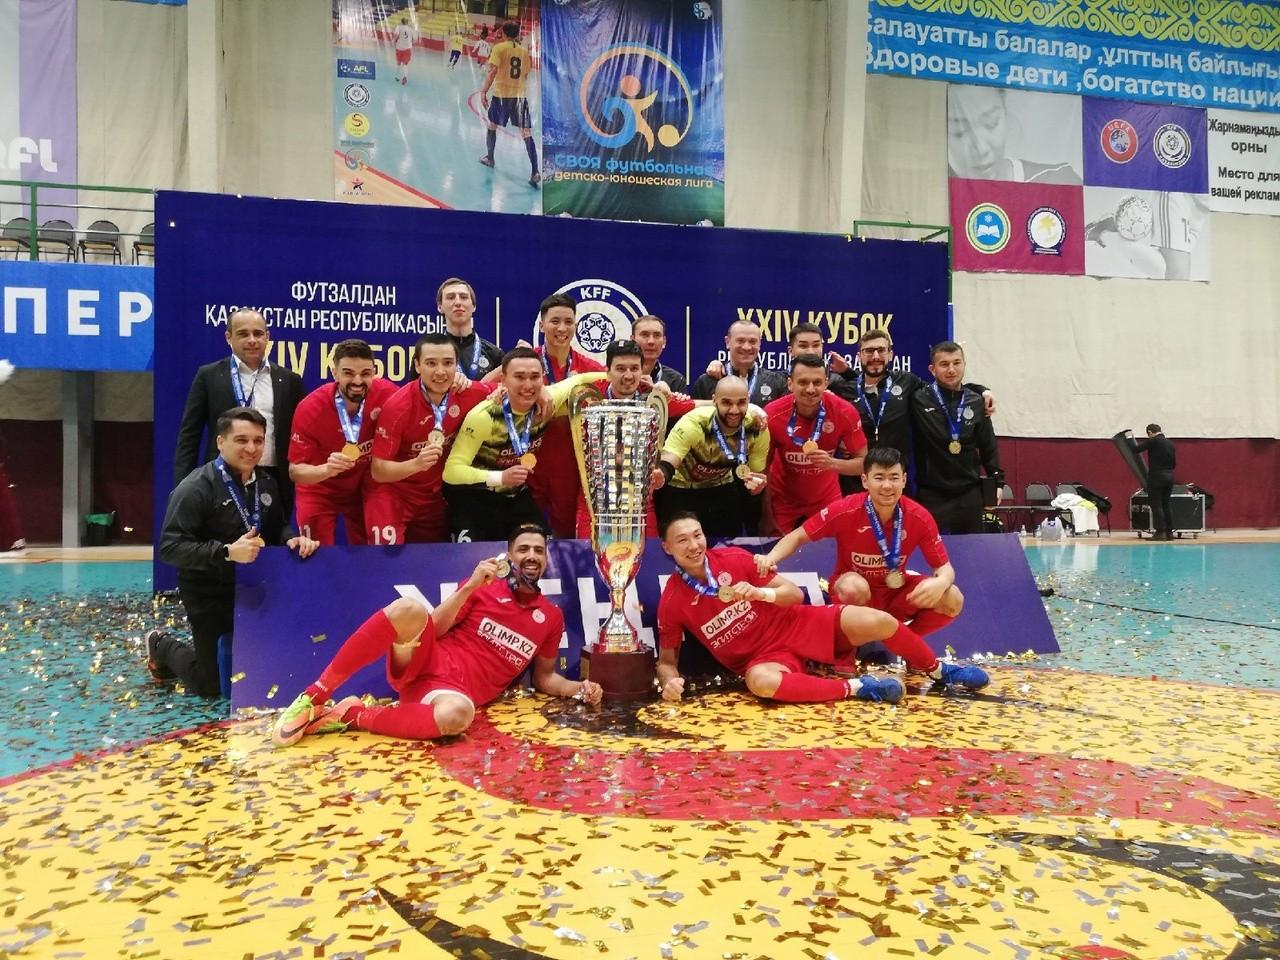 Кубок Казахстана по футзалу пройдет в Нур-Султане